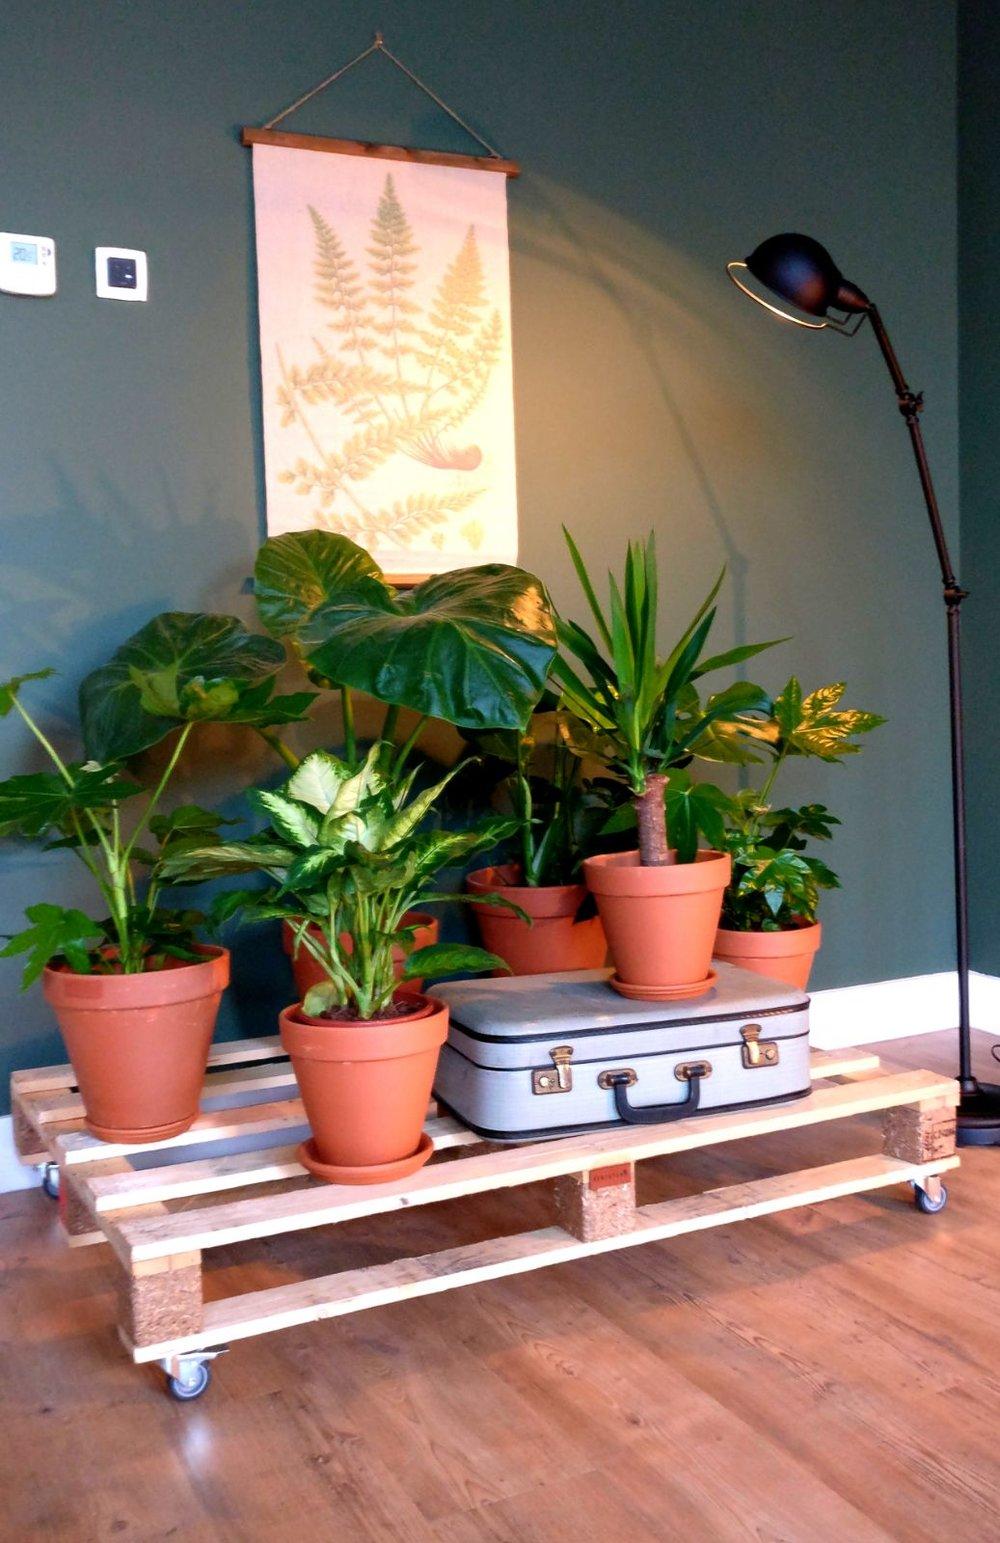 nieuwbouw woonkamer planten trolley pallet jieldé lamp urban jungle botanisch afbeelding vintage oude koffer mosgroen ral 6005 (2).jpg